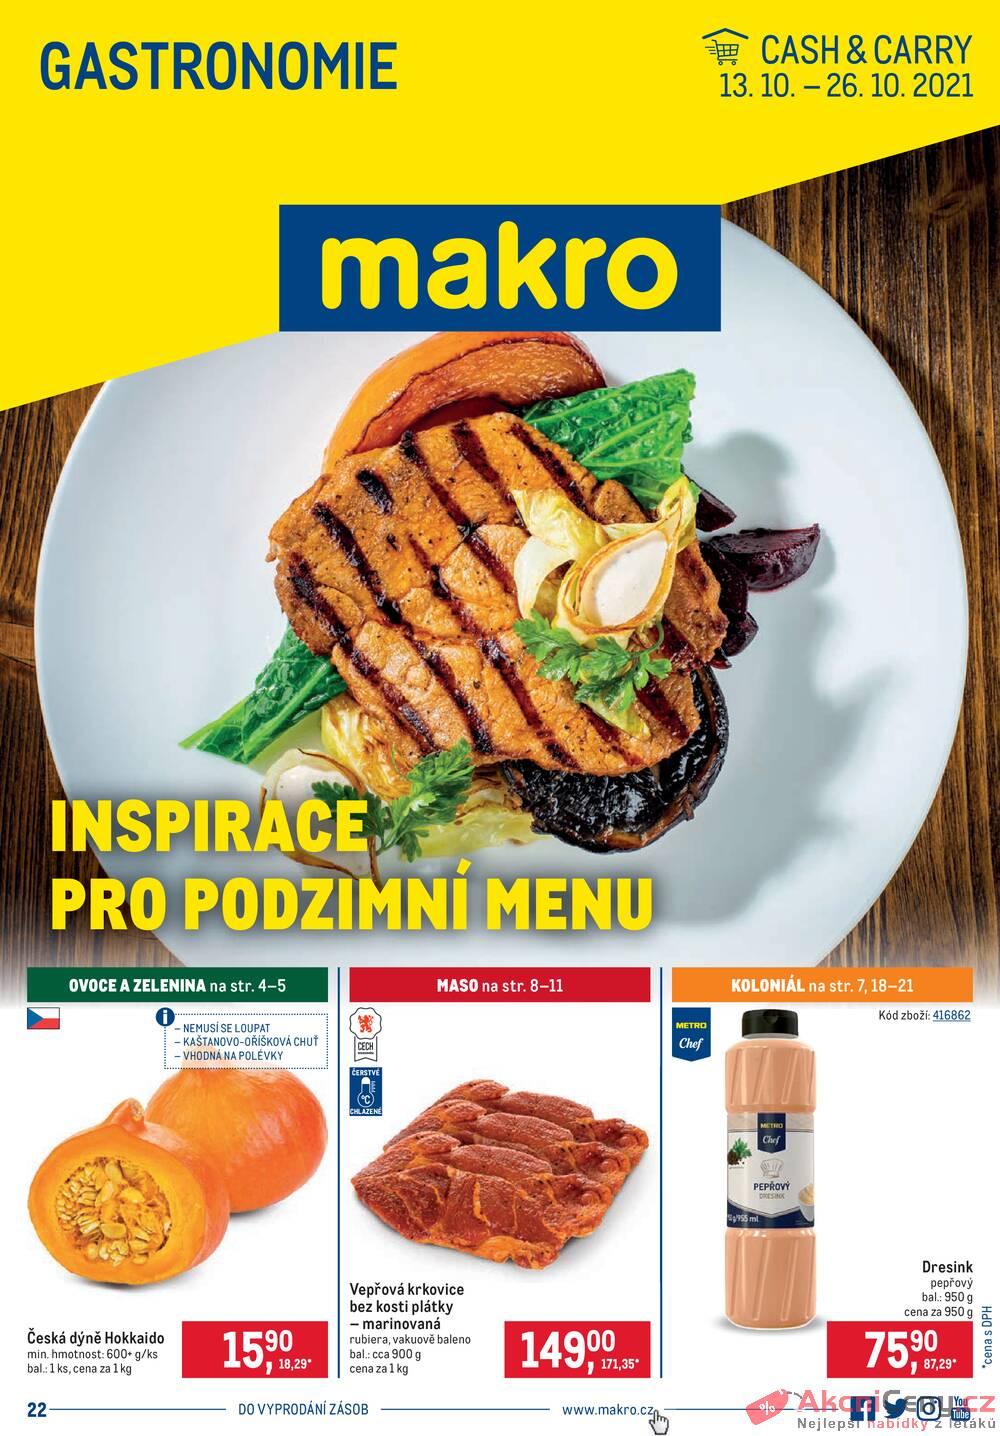 Leták MAKRO - Makro Gastronomie do 26.10. - strana 1